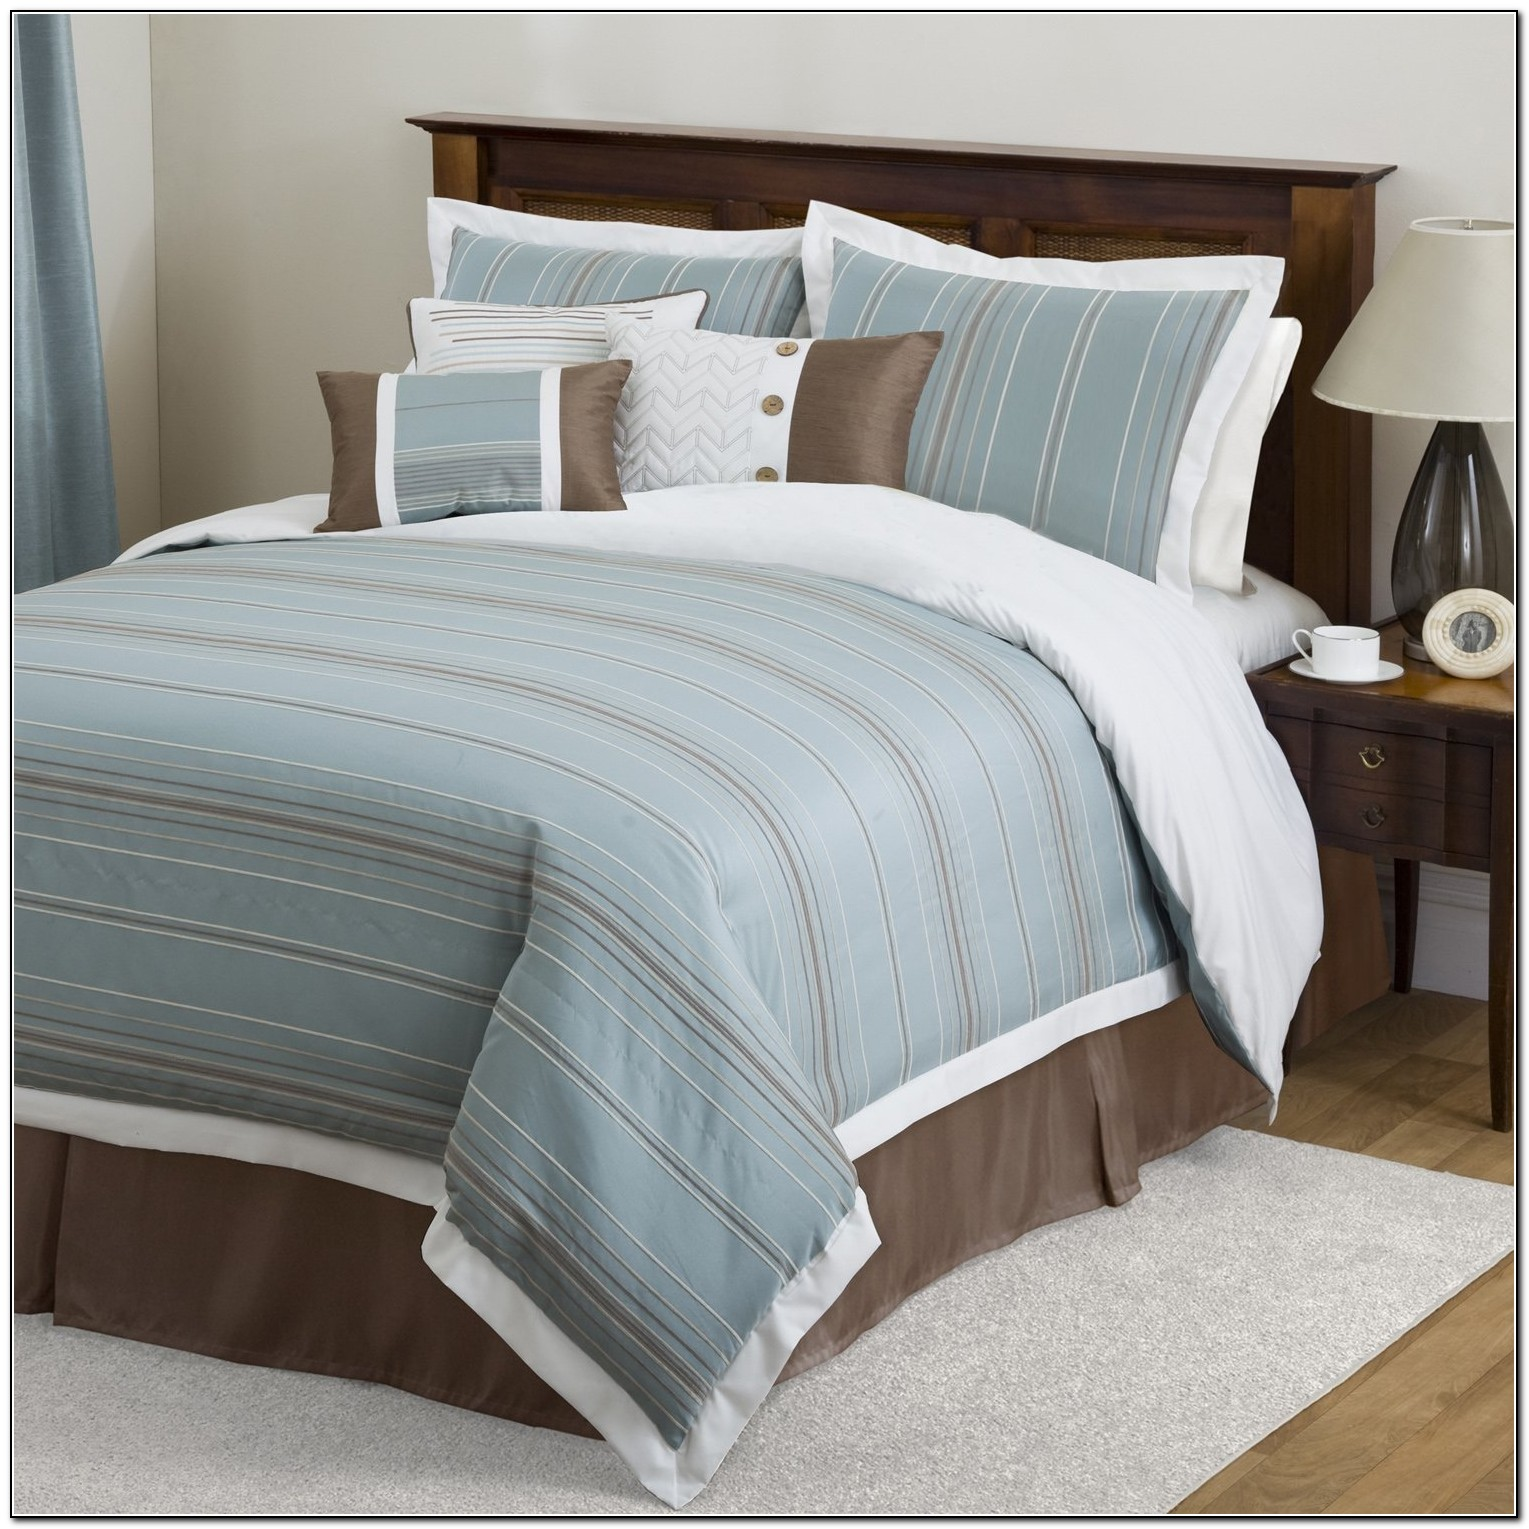 Queen Bedding Sets Target Beds Home Design Ideas Nmz